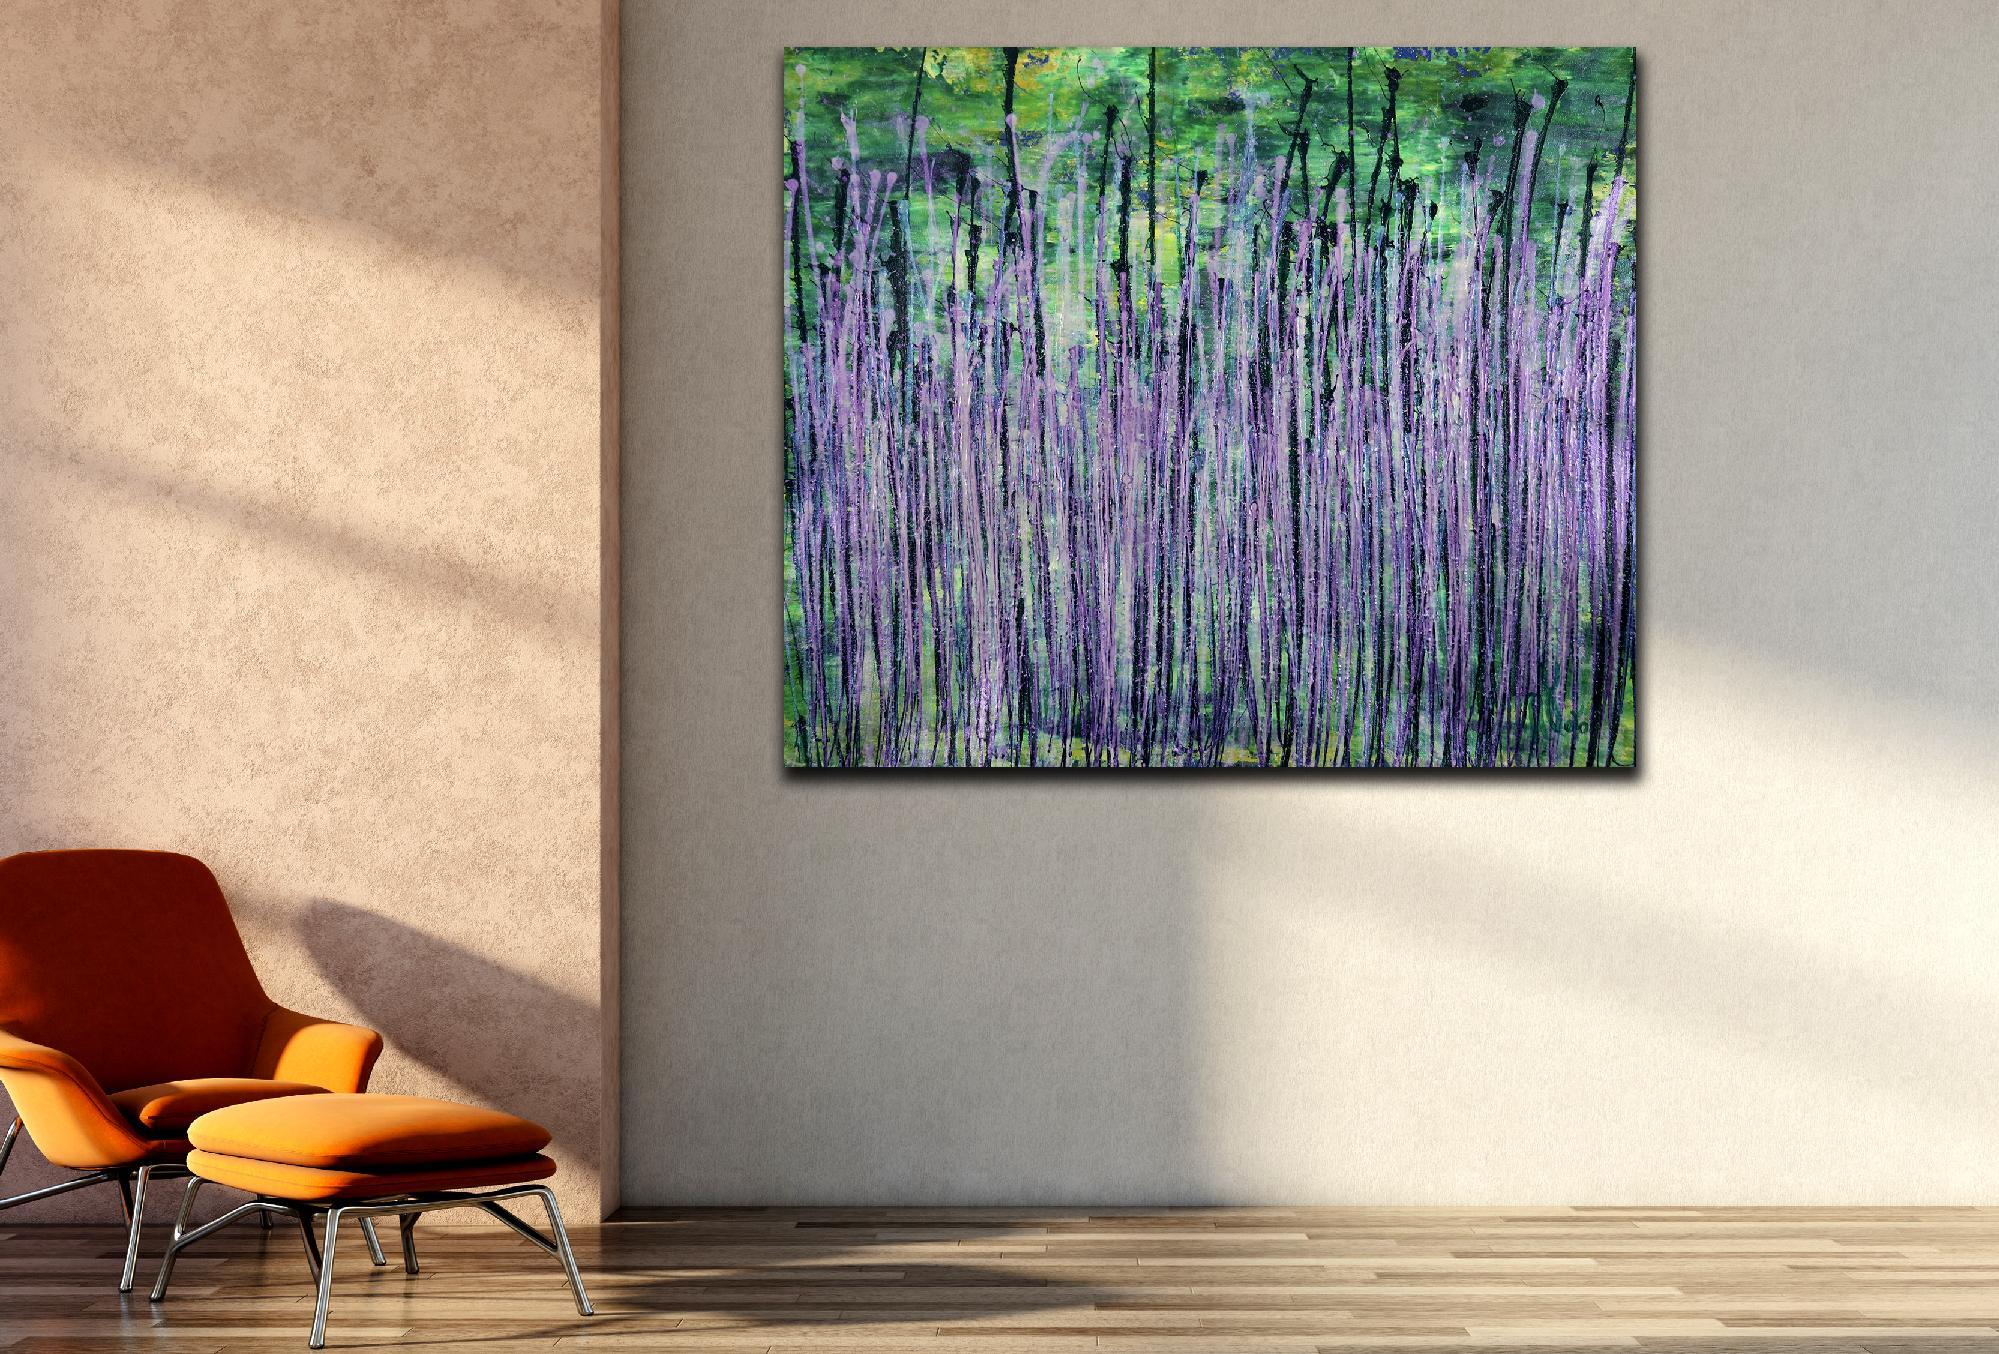 Room View - Natures Synergy (Blinding Lights) 2 (2020) by Nestor Toro